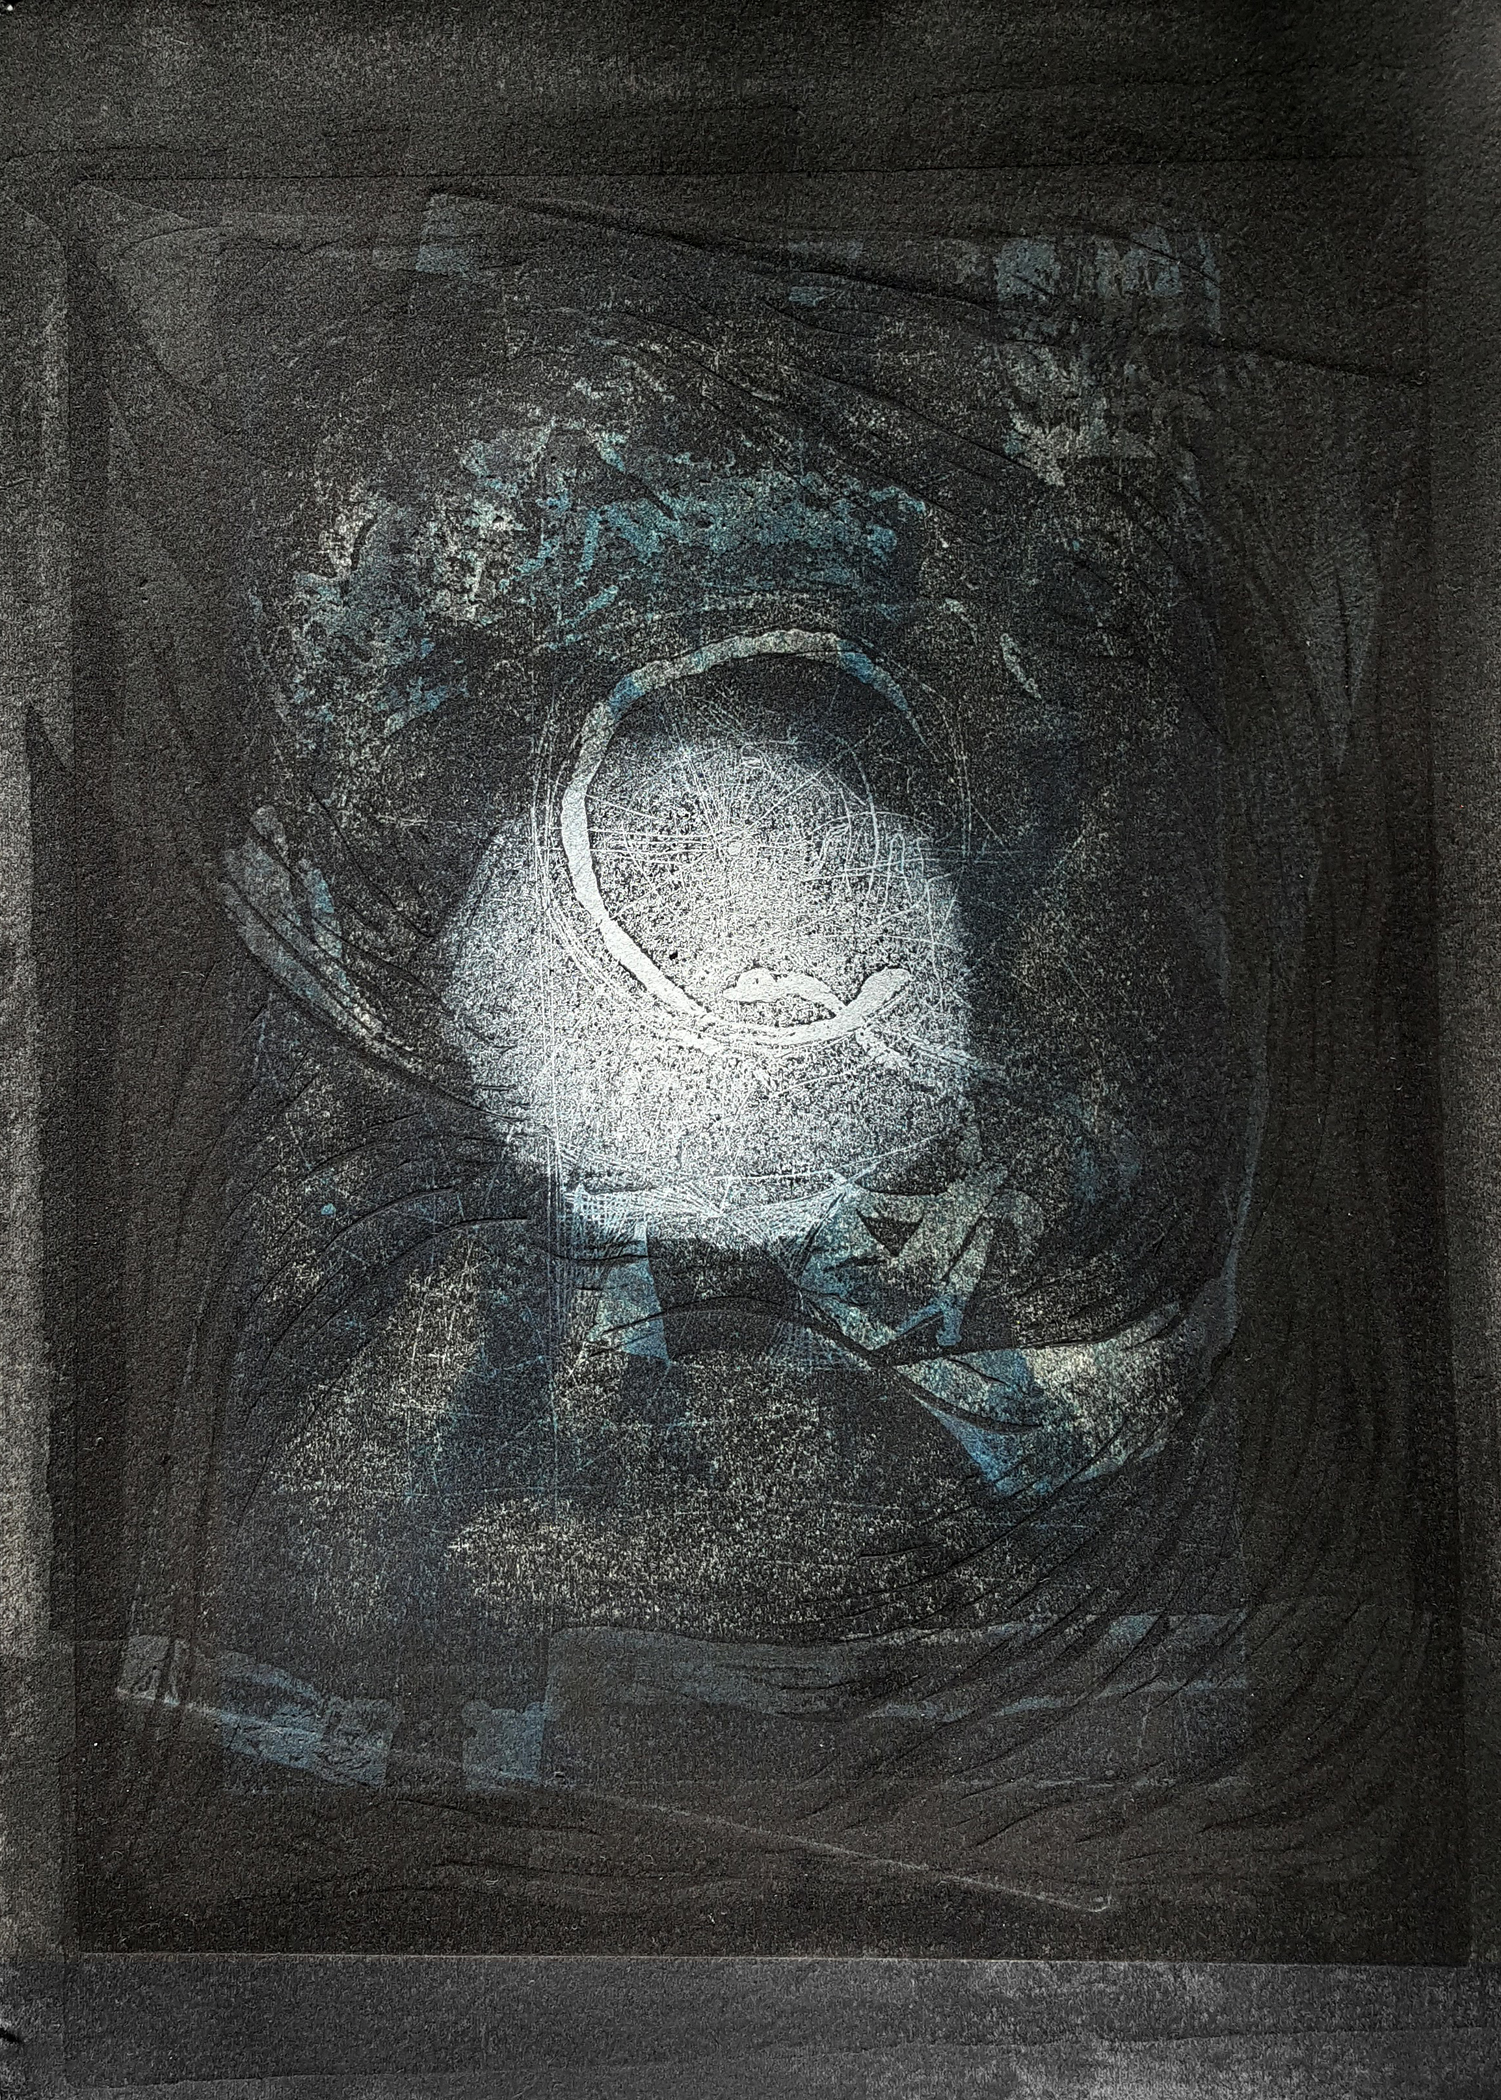 "'Moon Eclipse', etching, linocut, monoprint, 15"" x 12"", $300"